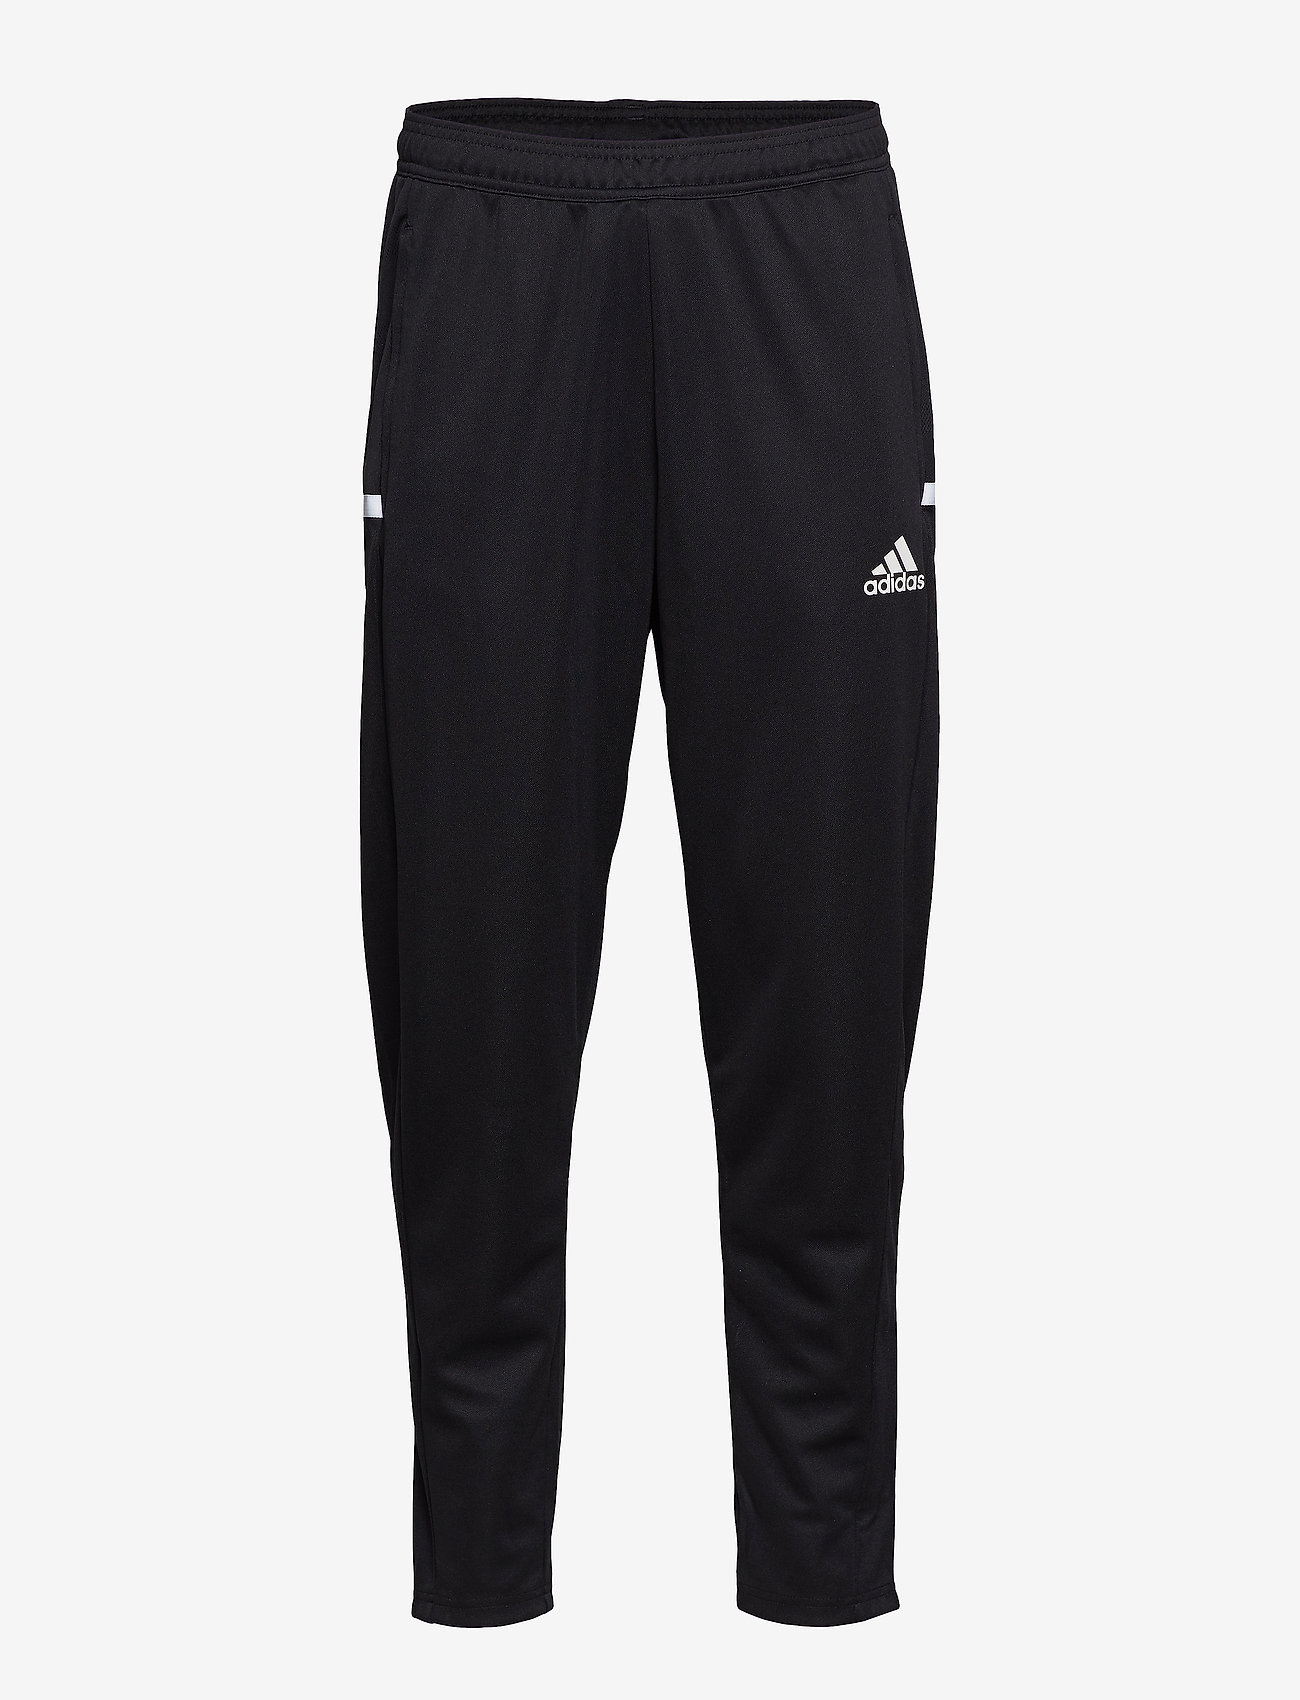 adidas Performance - T19 TRK PNT M - pants - black - 1